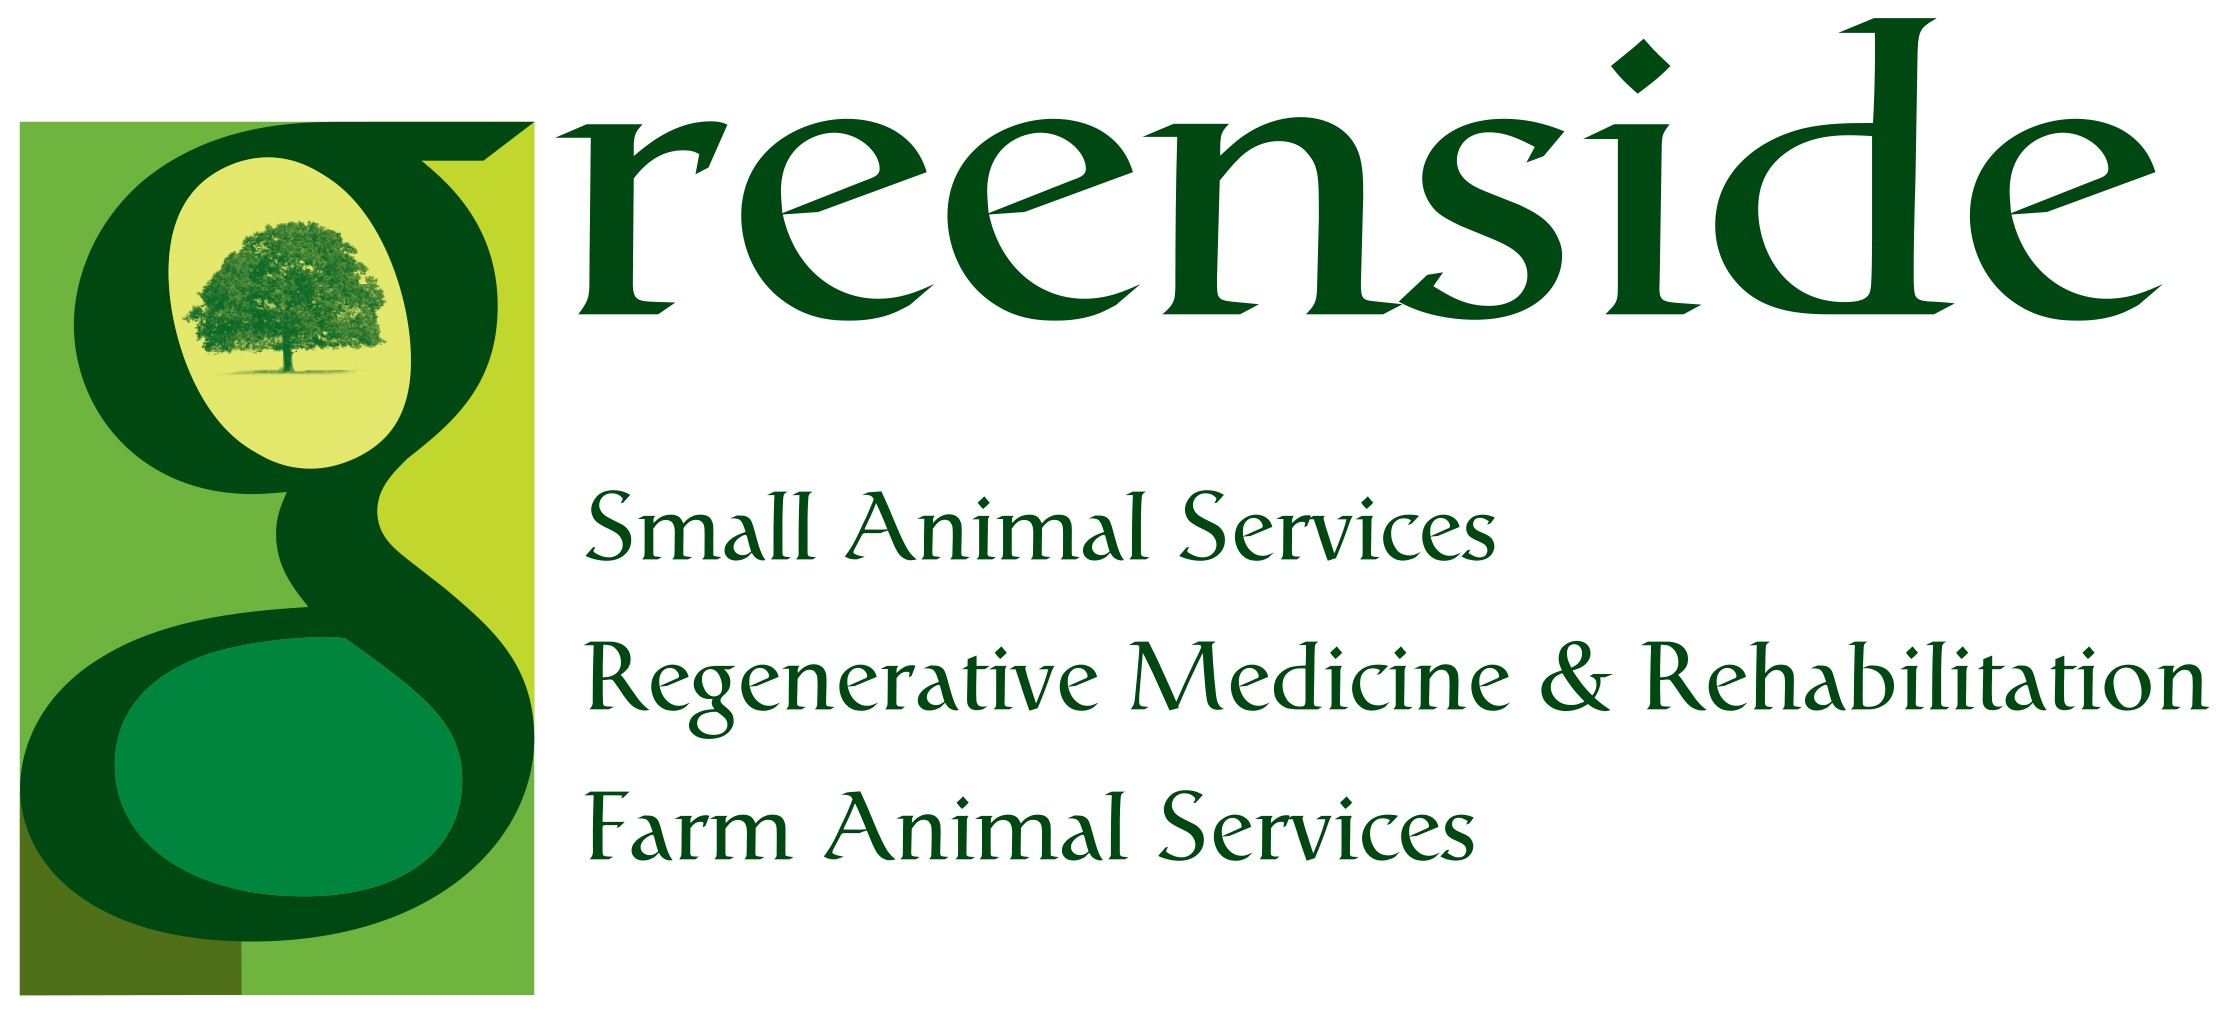 Greenside